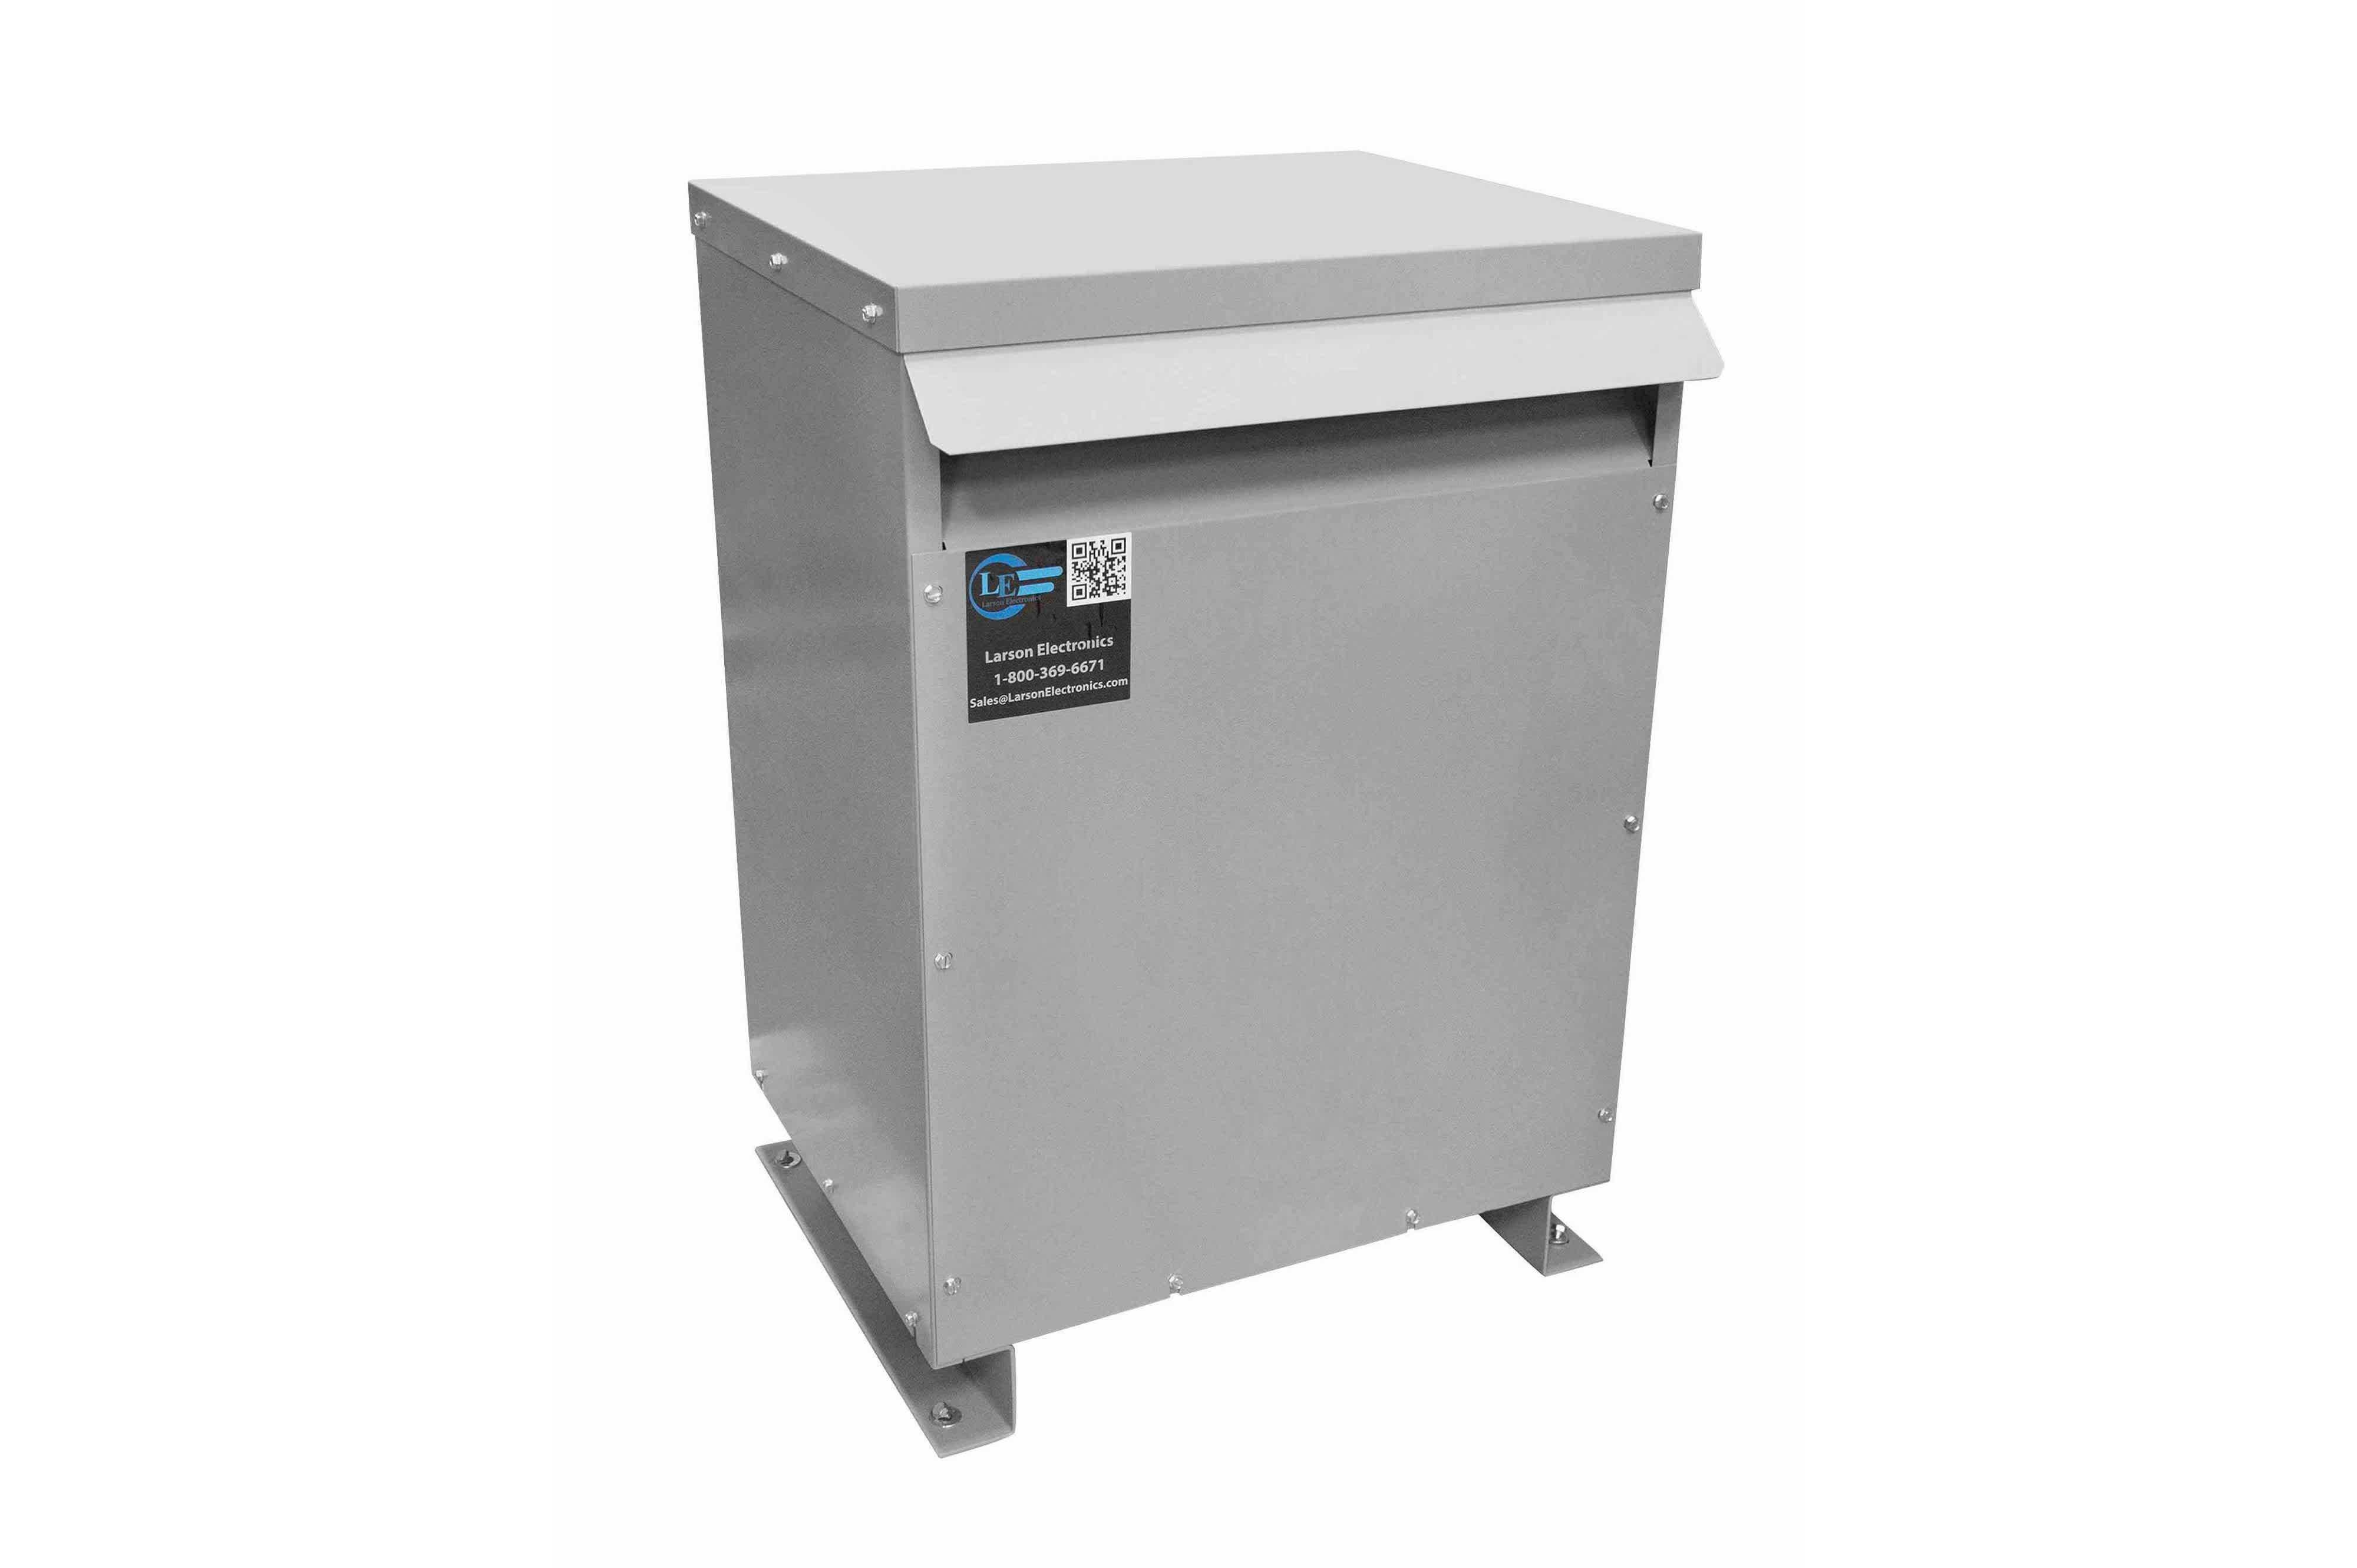 15 kVA 3PH Isolation Transformer, 230V Wye Primary, 480V Delta Secondary, N3R, Ventilated, 60 Hz